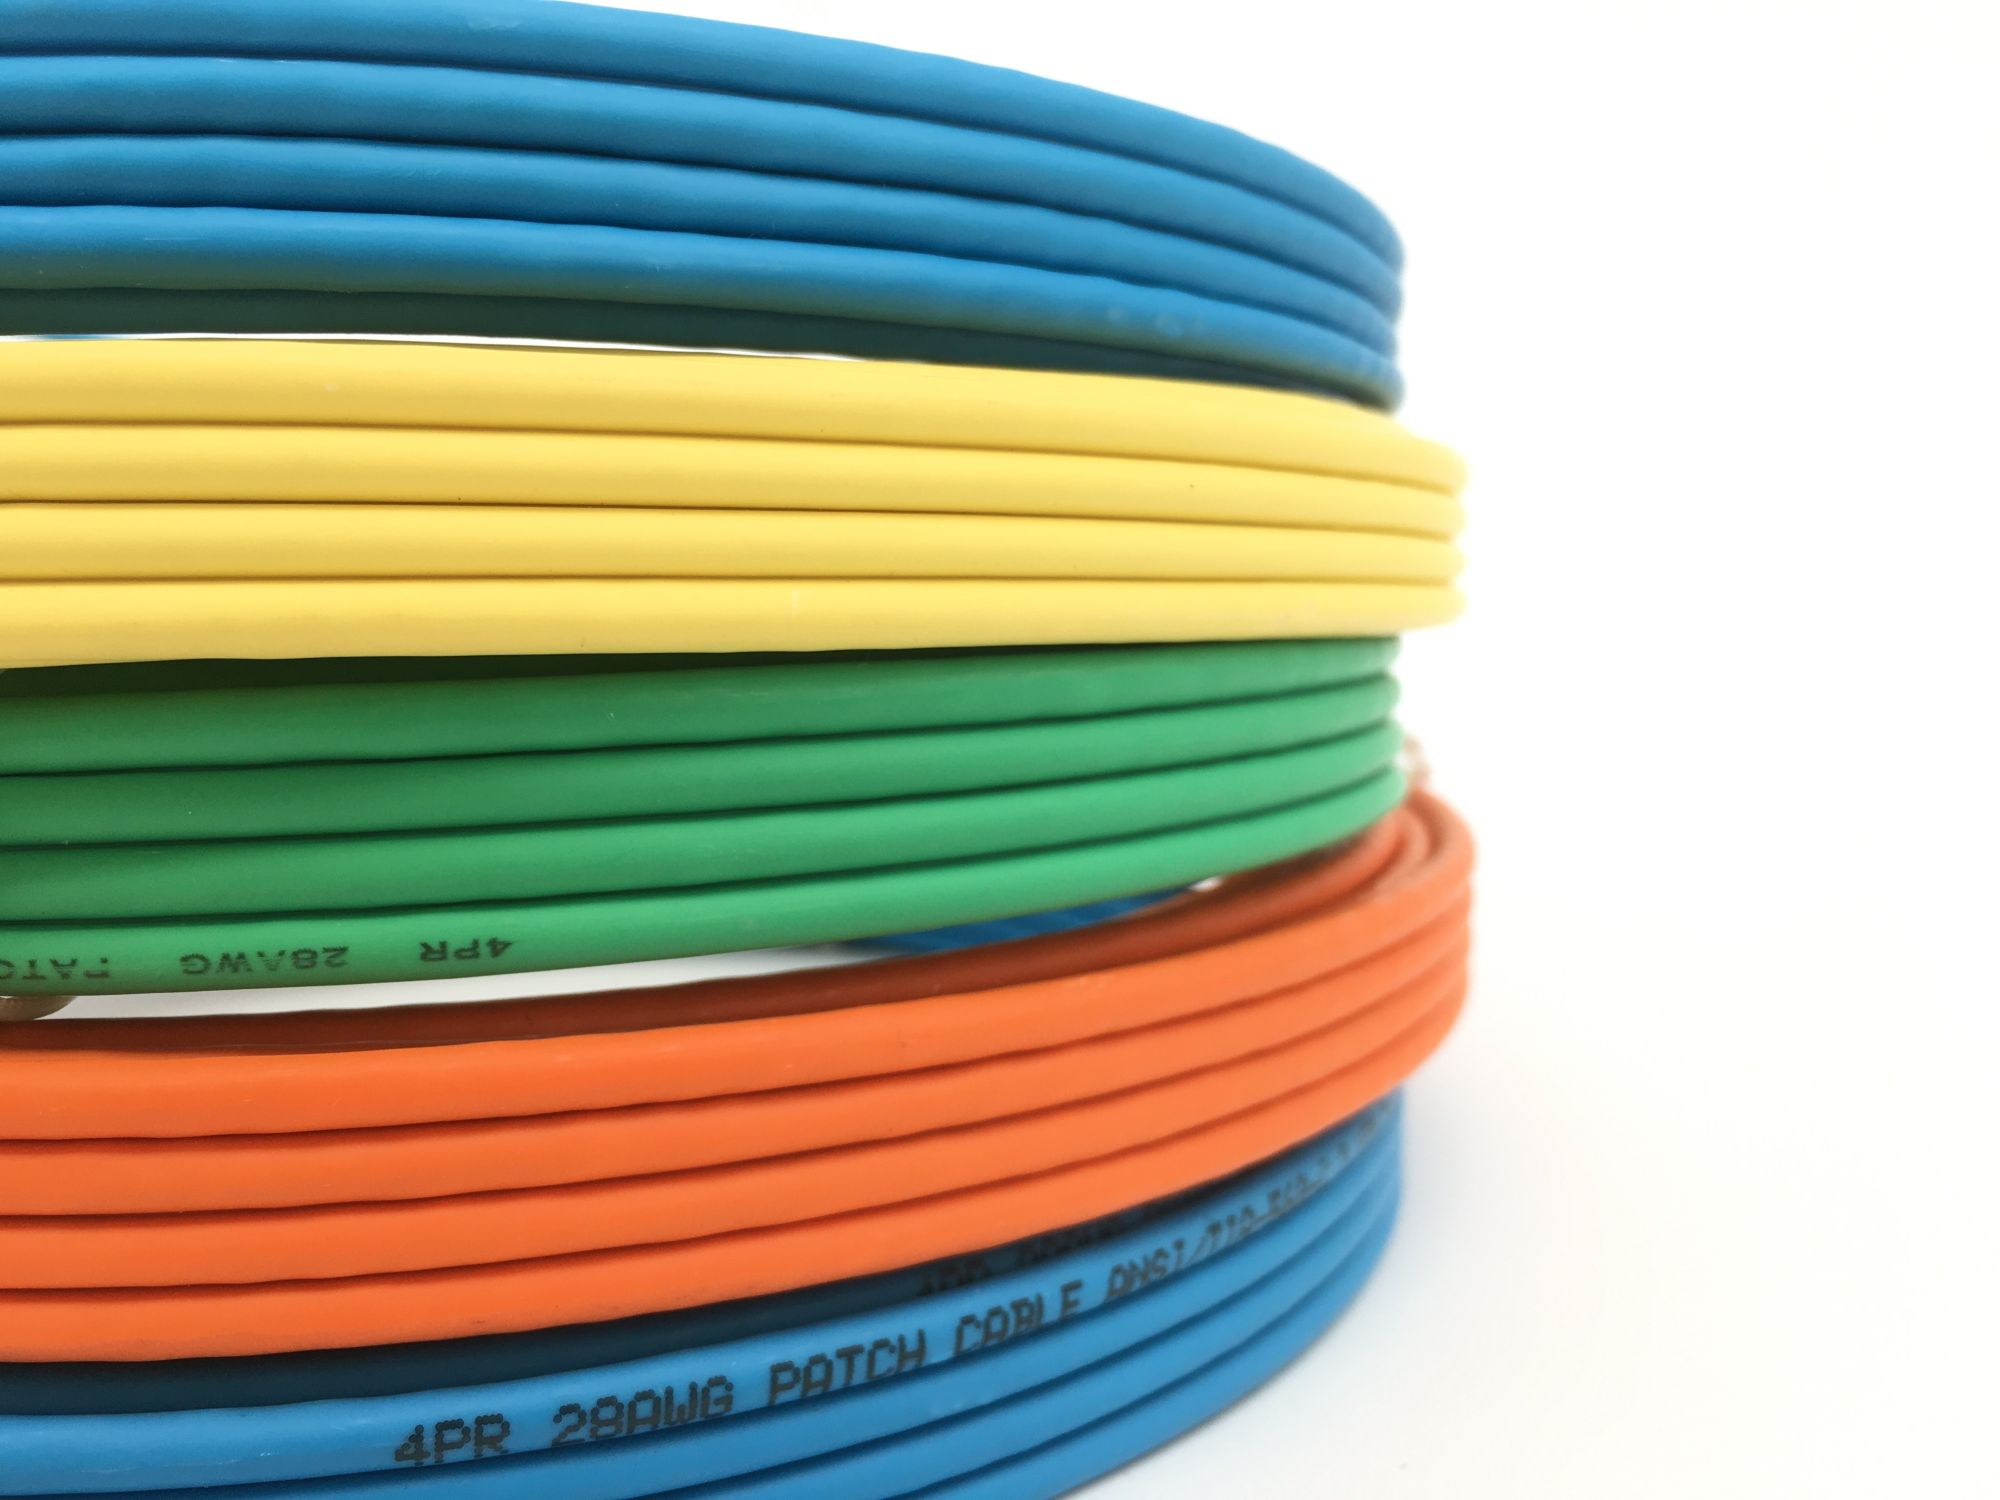 Flachband-Patchkabel